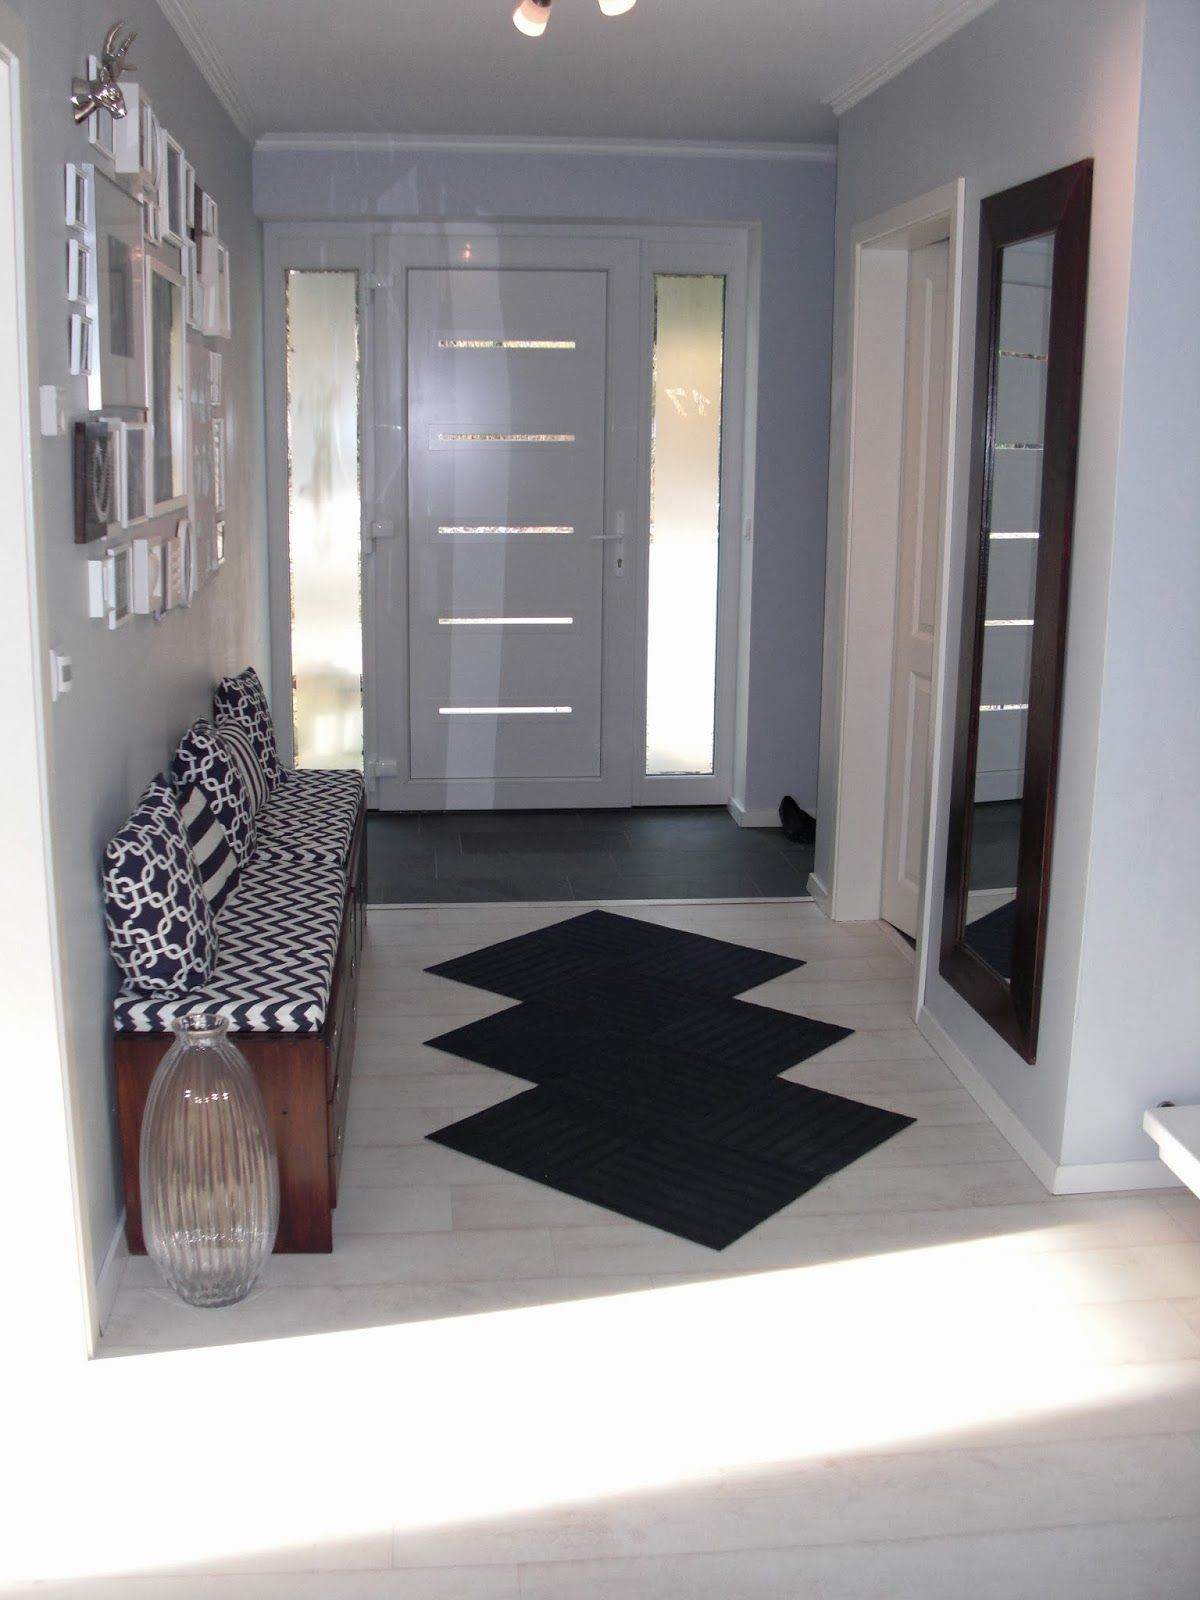 Dyi Flur Teppich Fur 7 00 Teppich Flur Schlafzimmer